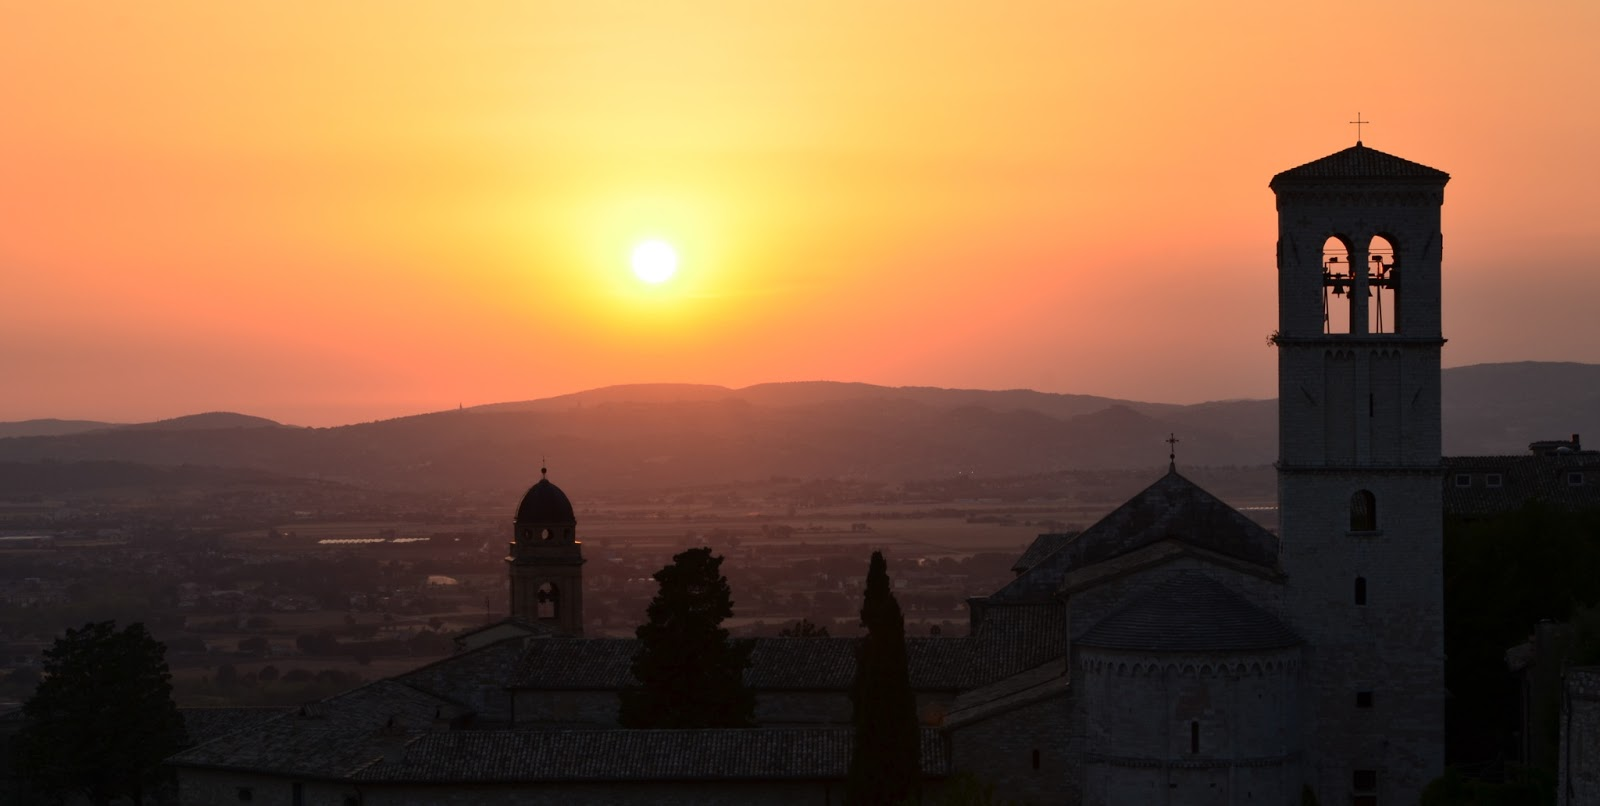 Umbria A voyage to the Umbria region Italy Europe